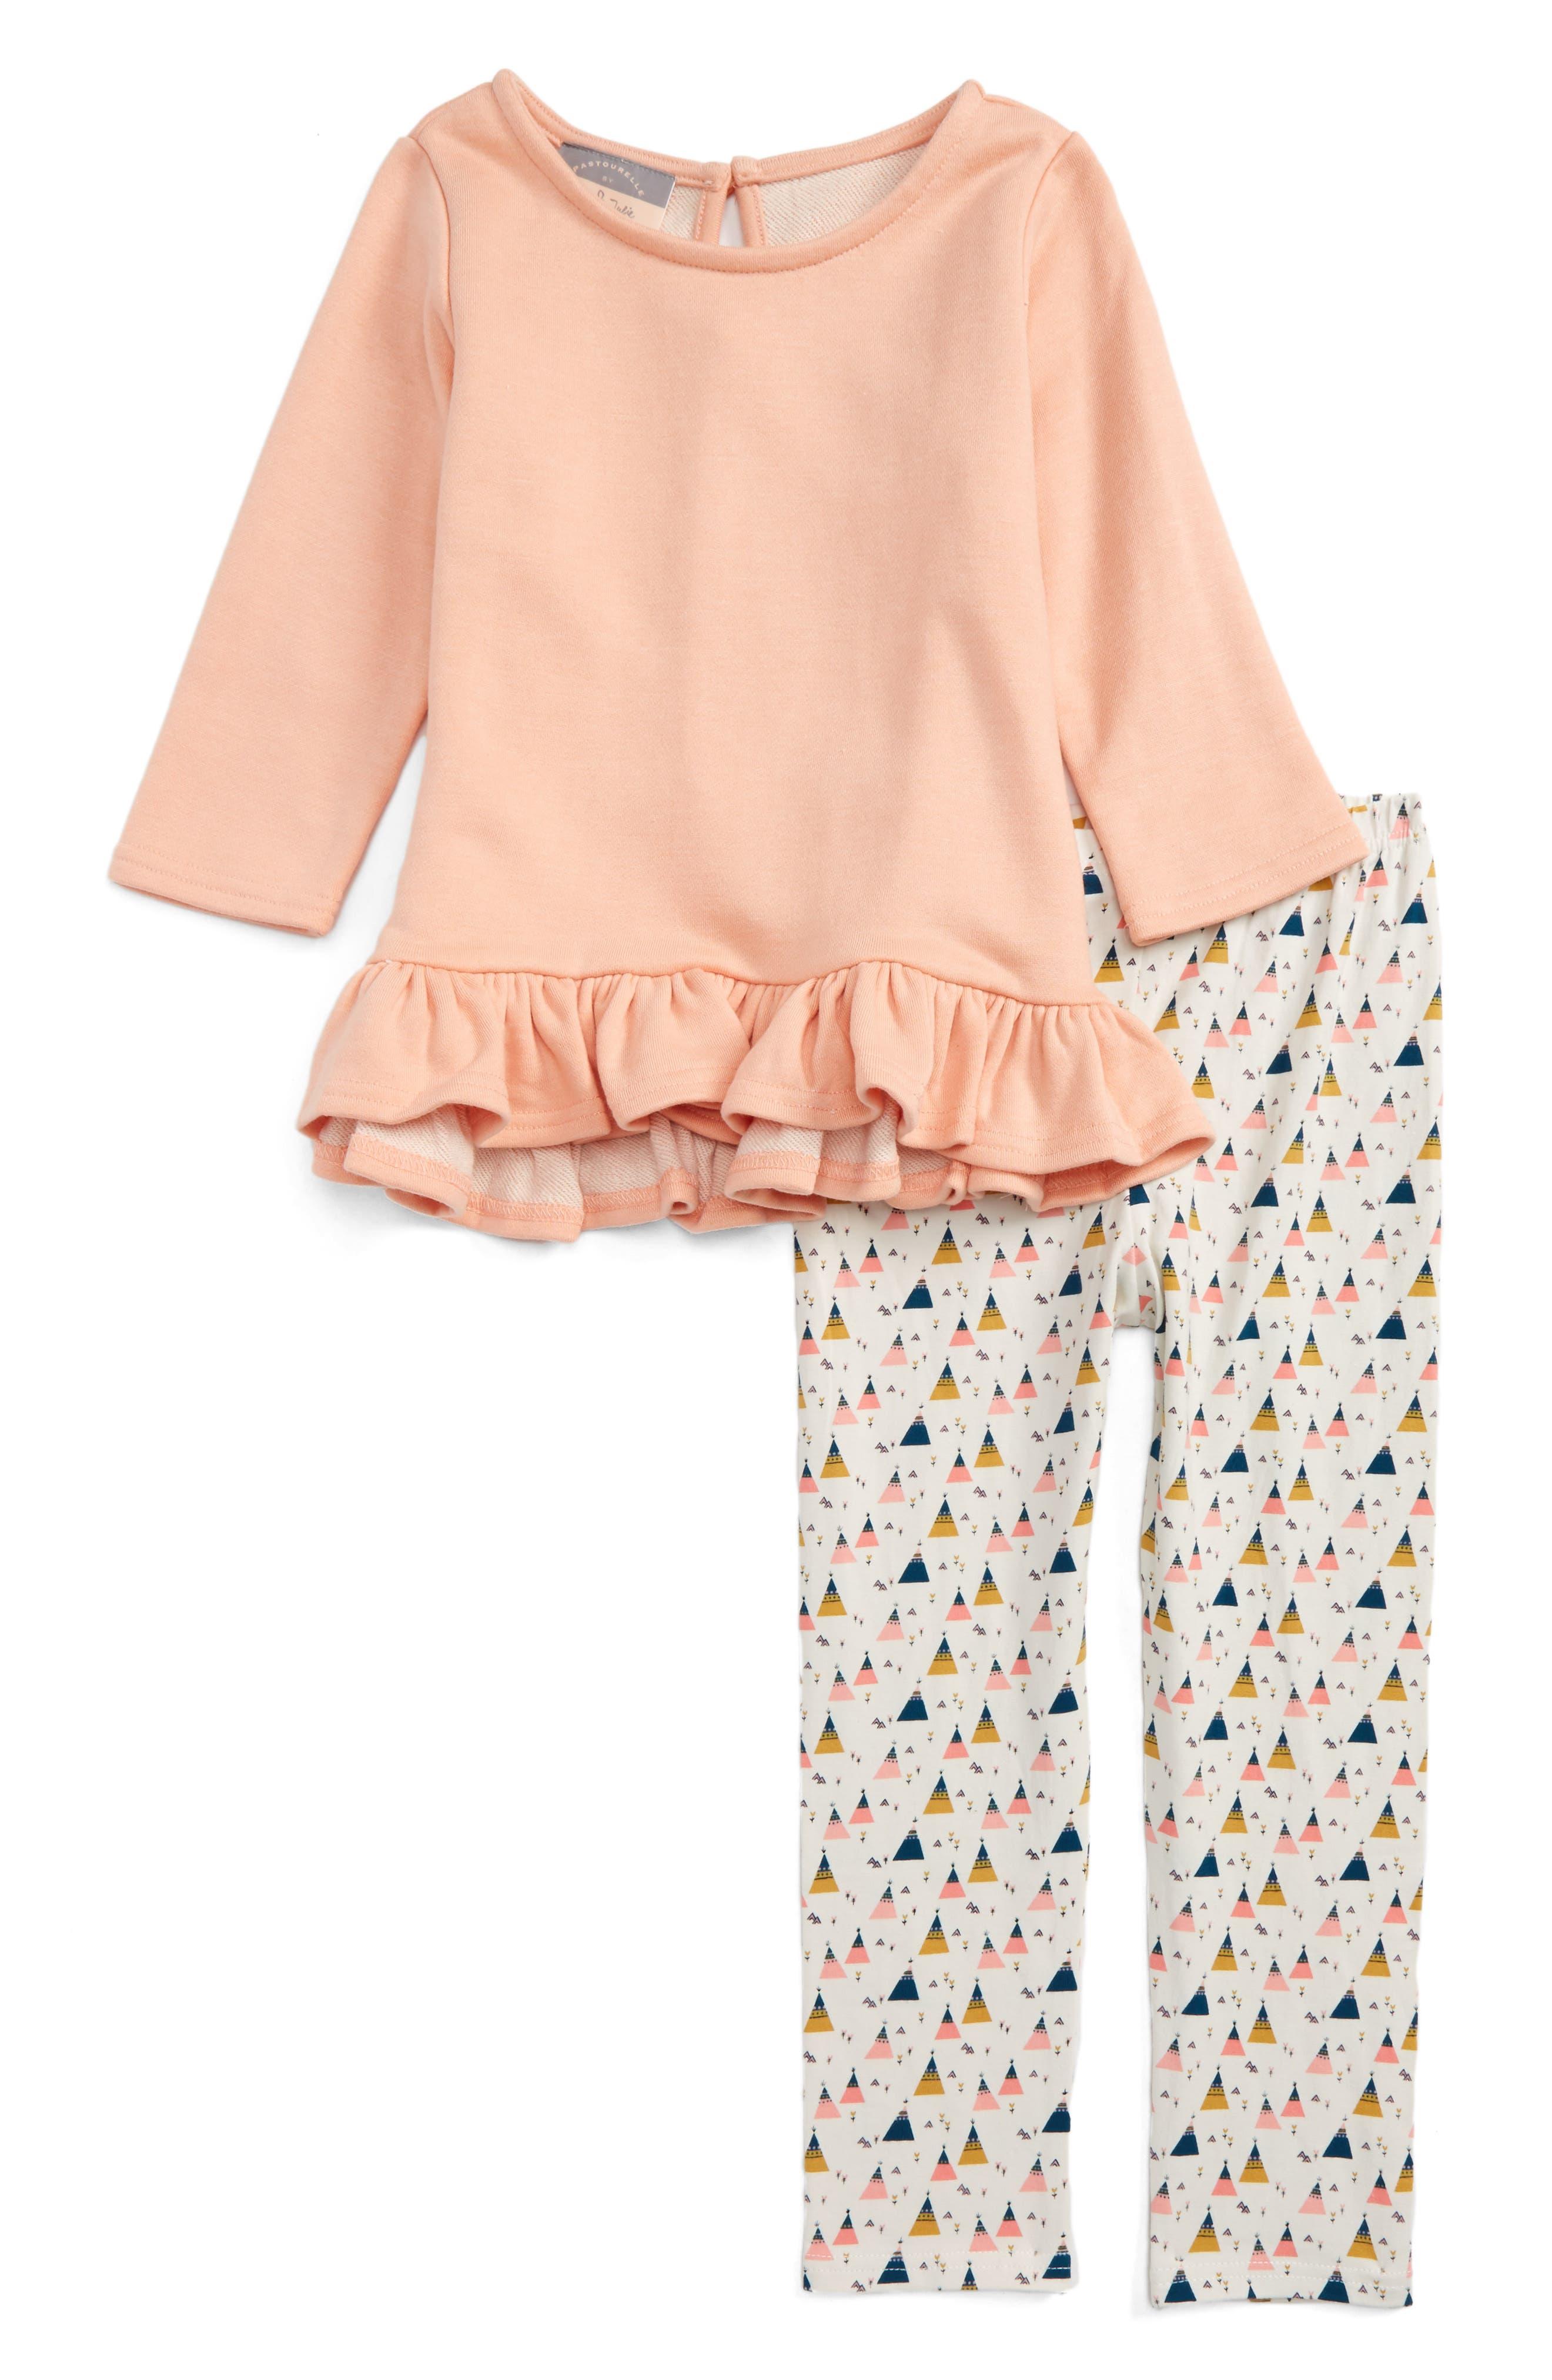 Main Image - Pastourelle by Pippa and Julie Dress & Leggings Set (Toddler Girls & Little Girls)